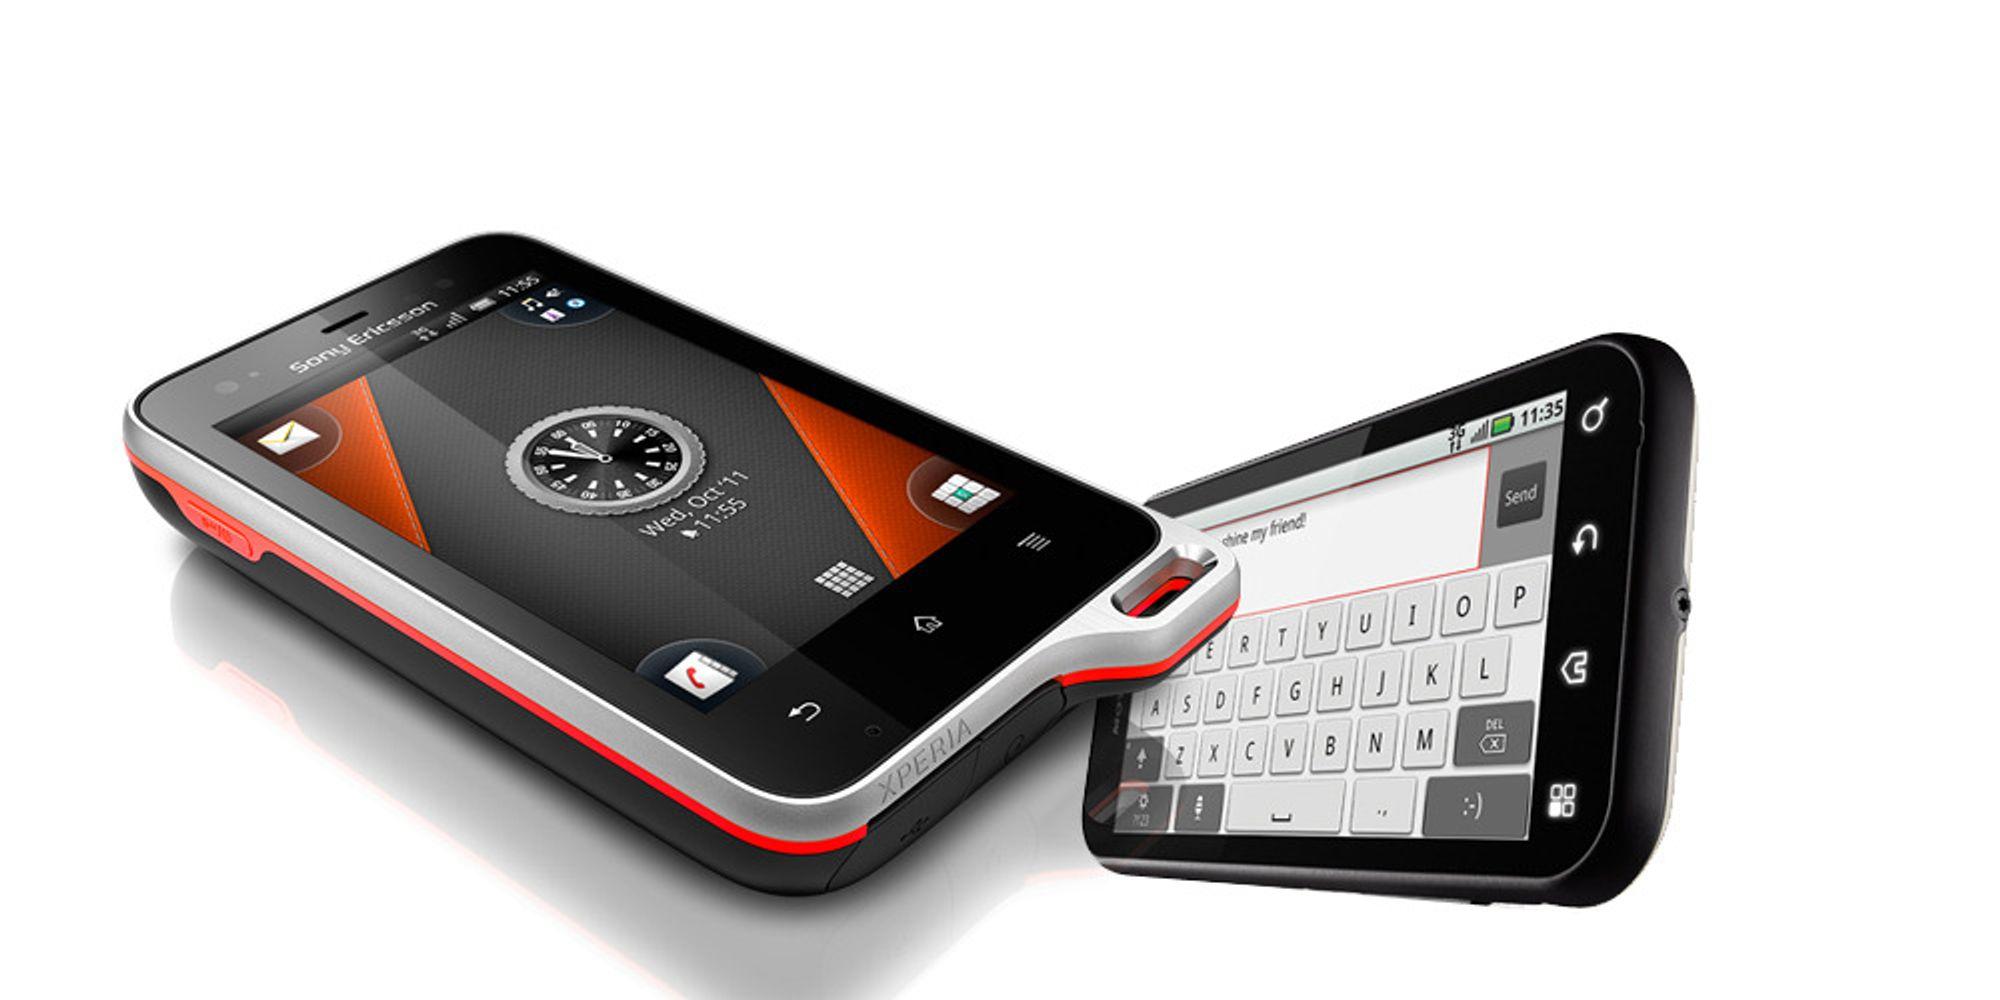 Spec-duell: Xperia Active VS Moto Defy